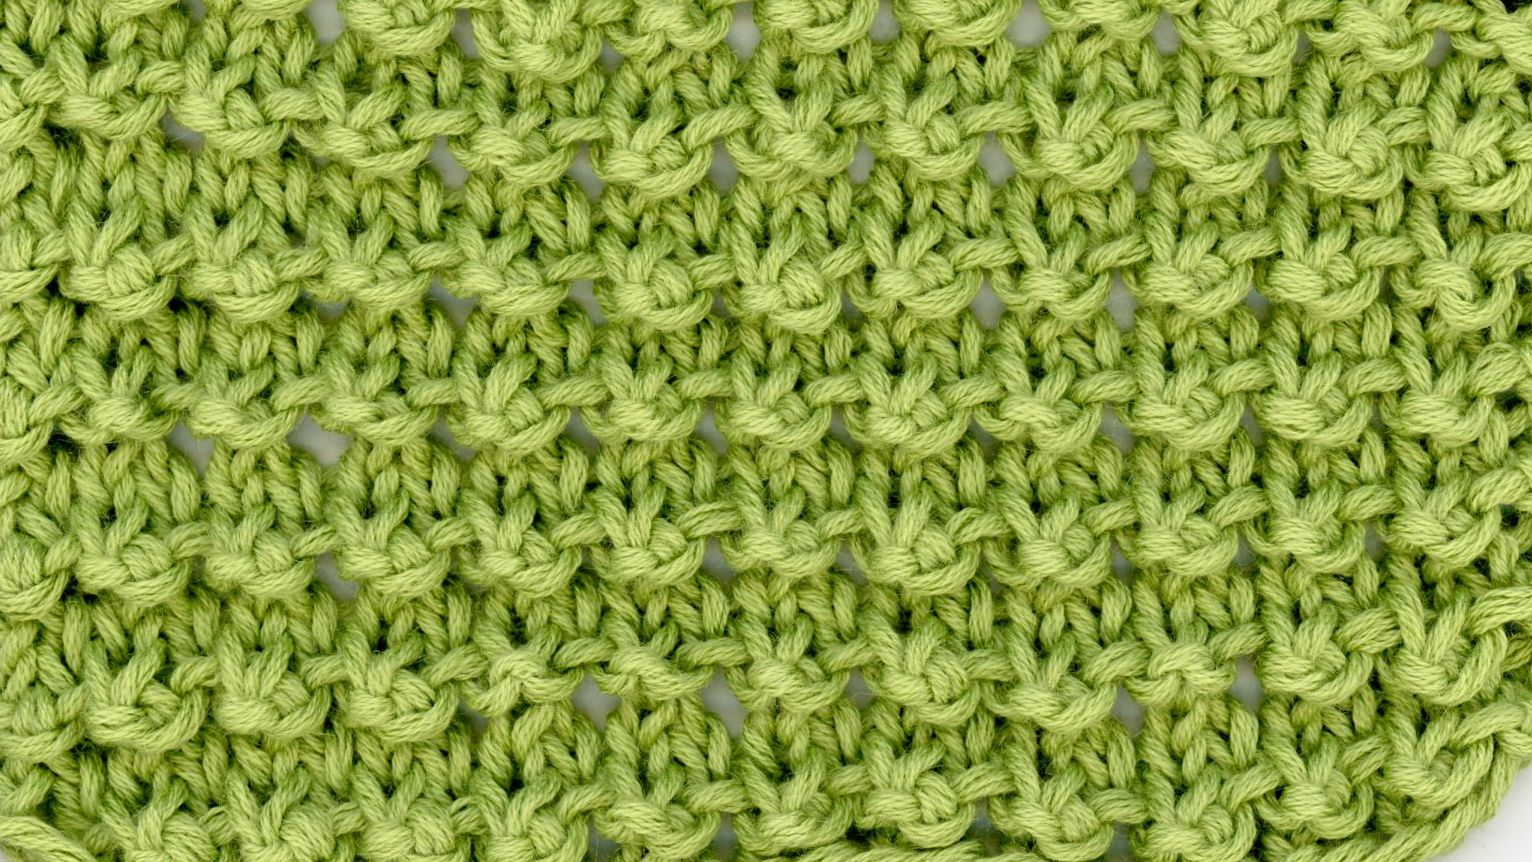 green textured knitting stitch pattern